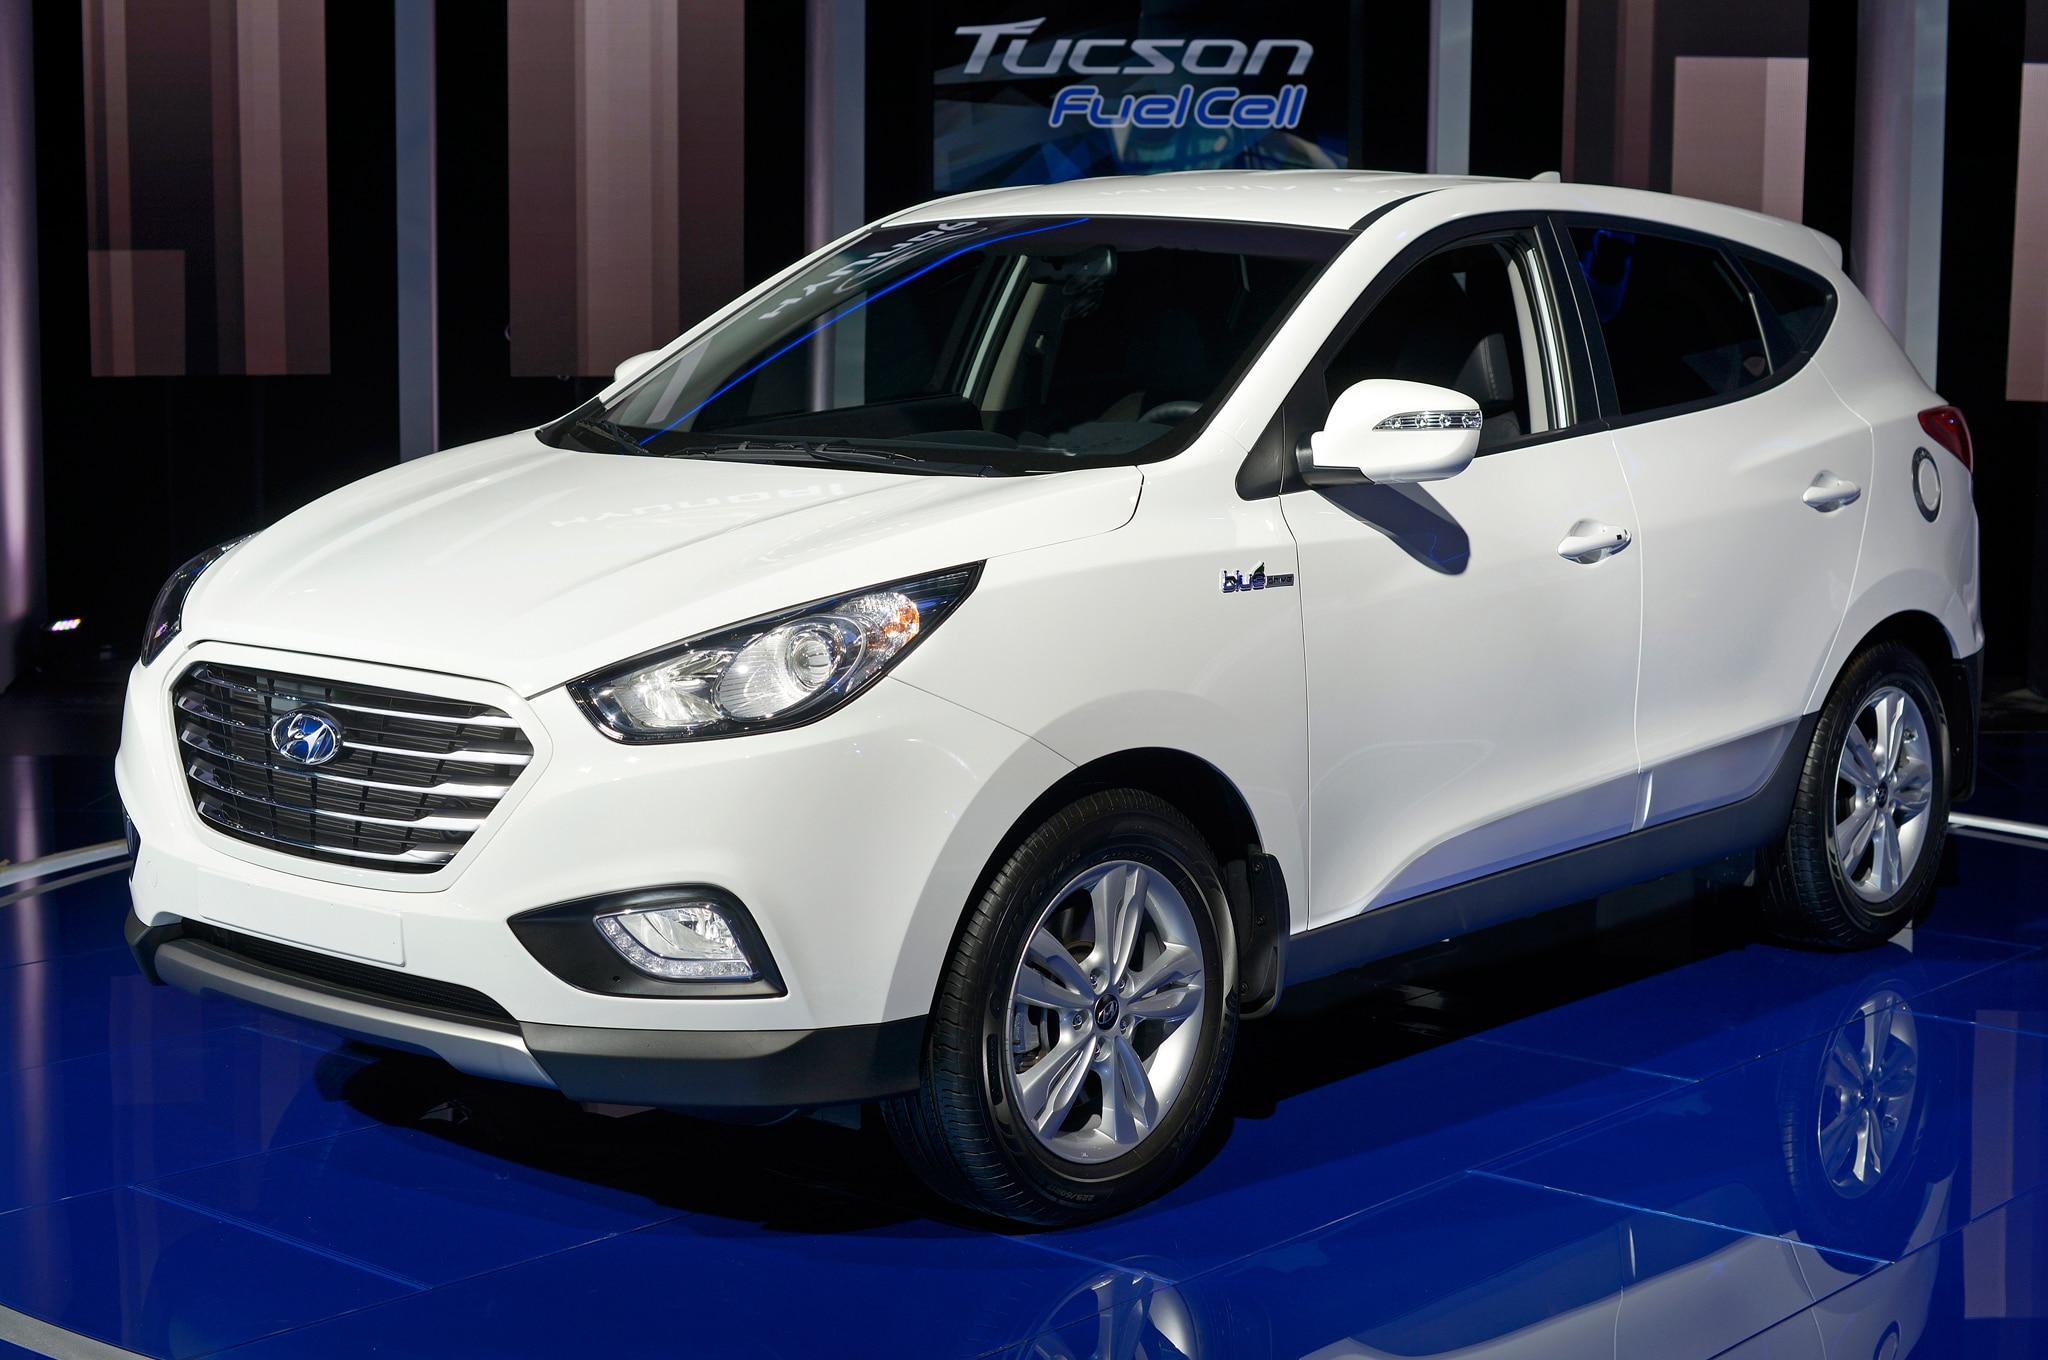 2014 Hyundai Tucson Fuel Cell Front Three Quarter